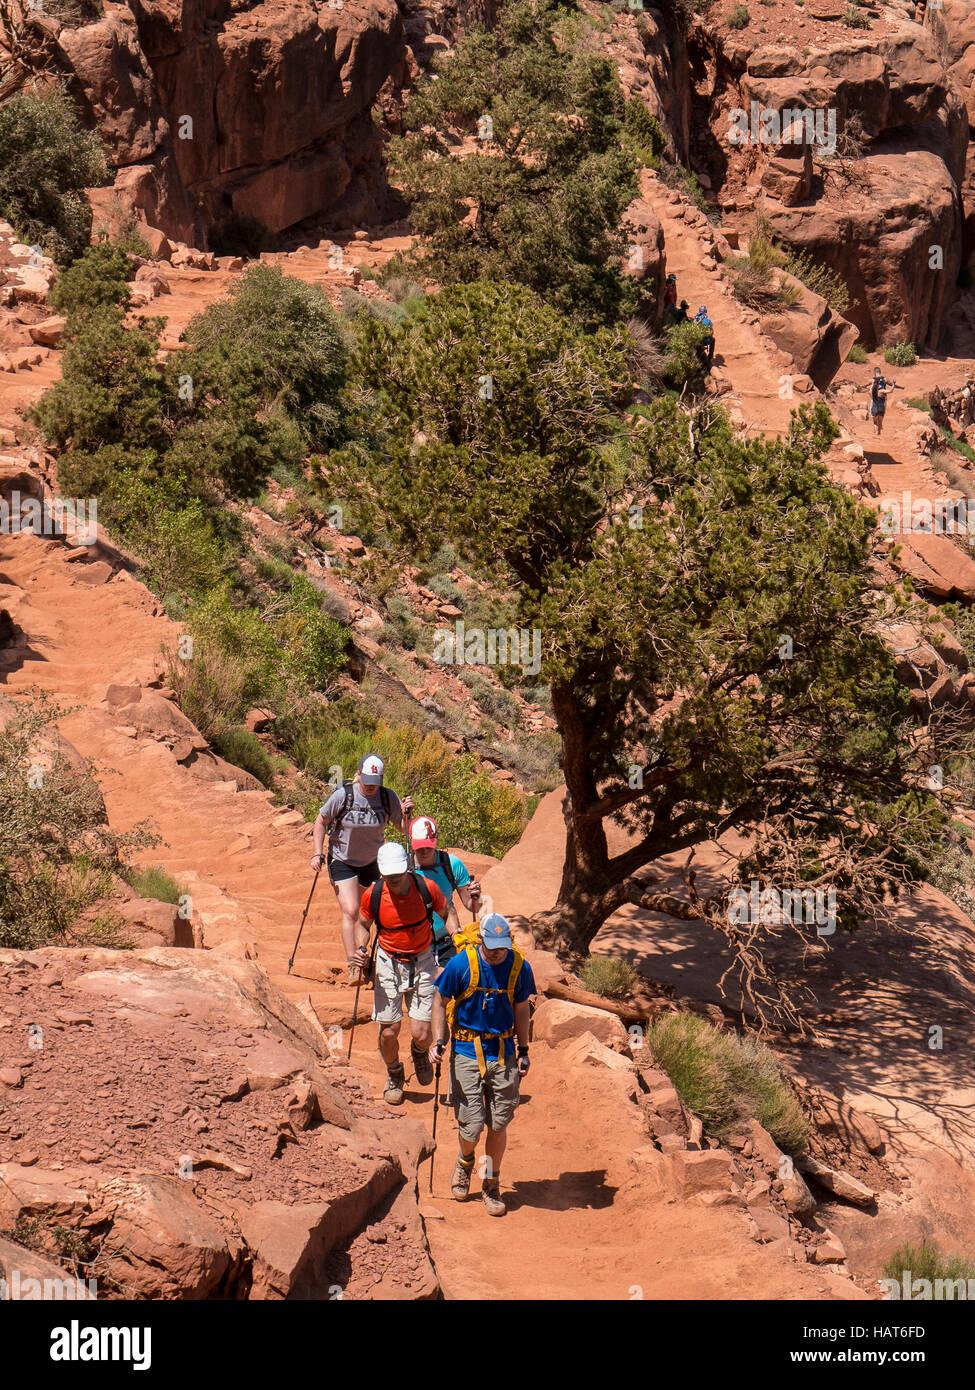 Hikers, South Kaibab Trail, Grand Canyon South Rim, Arizona. Stock Photo